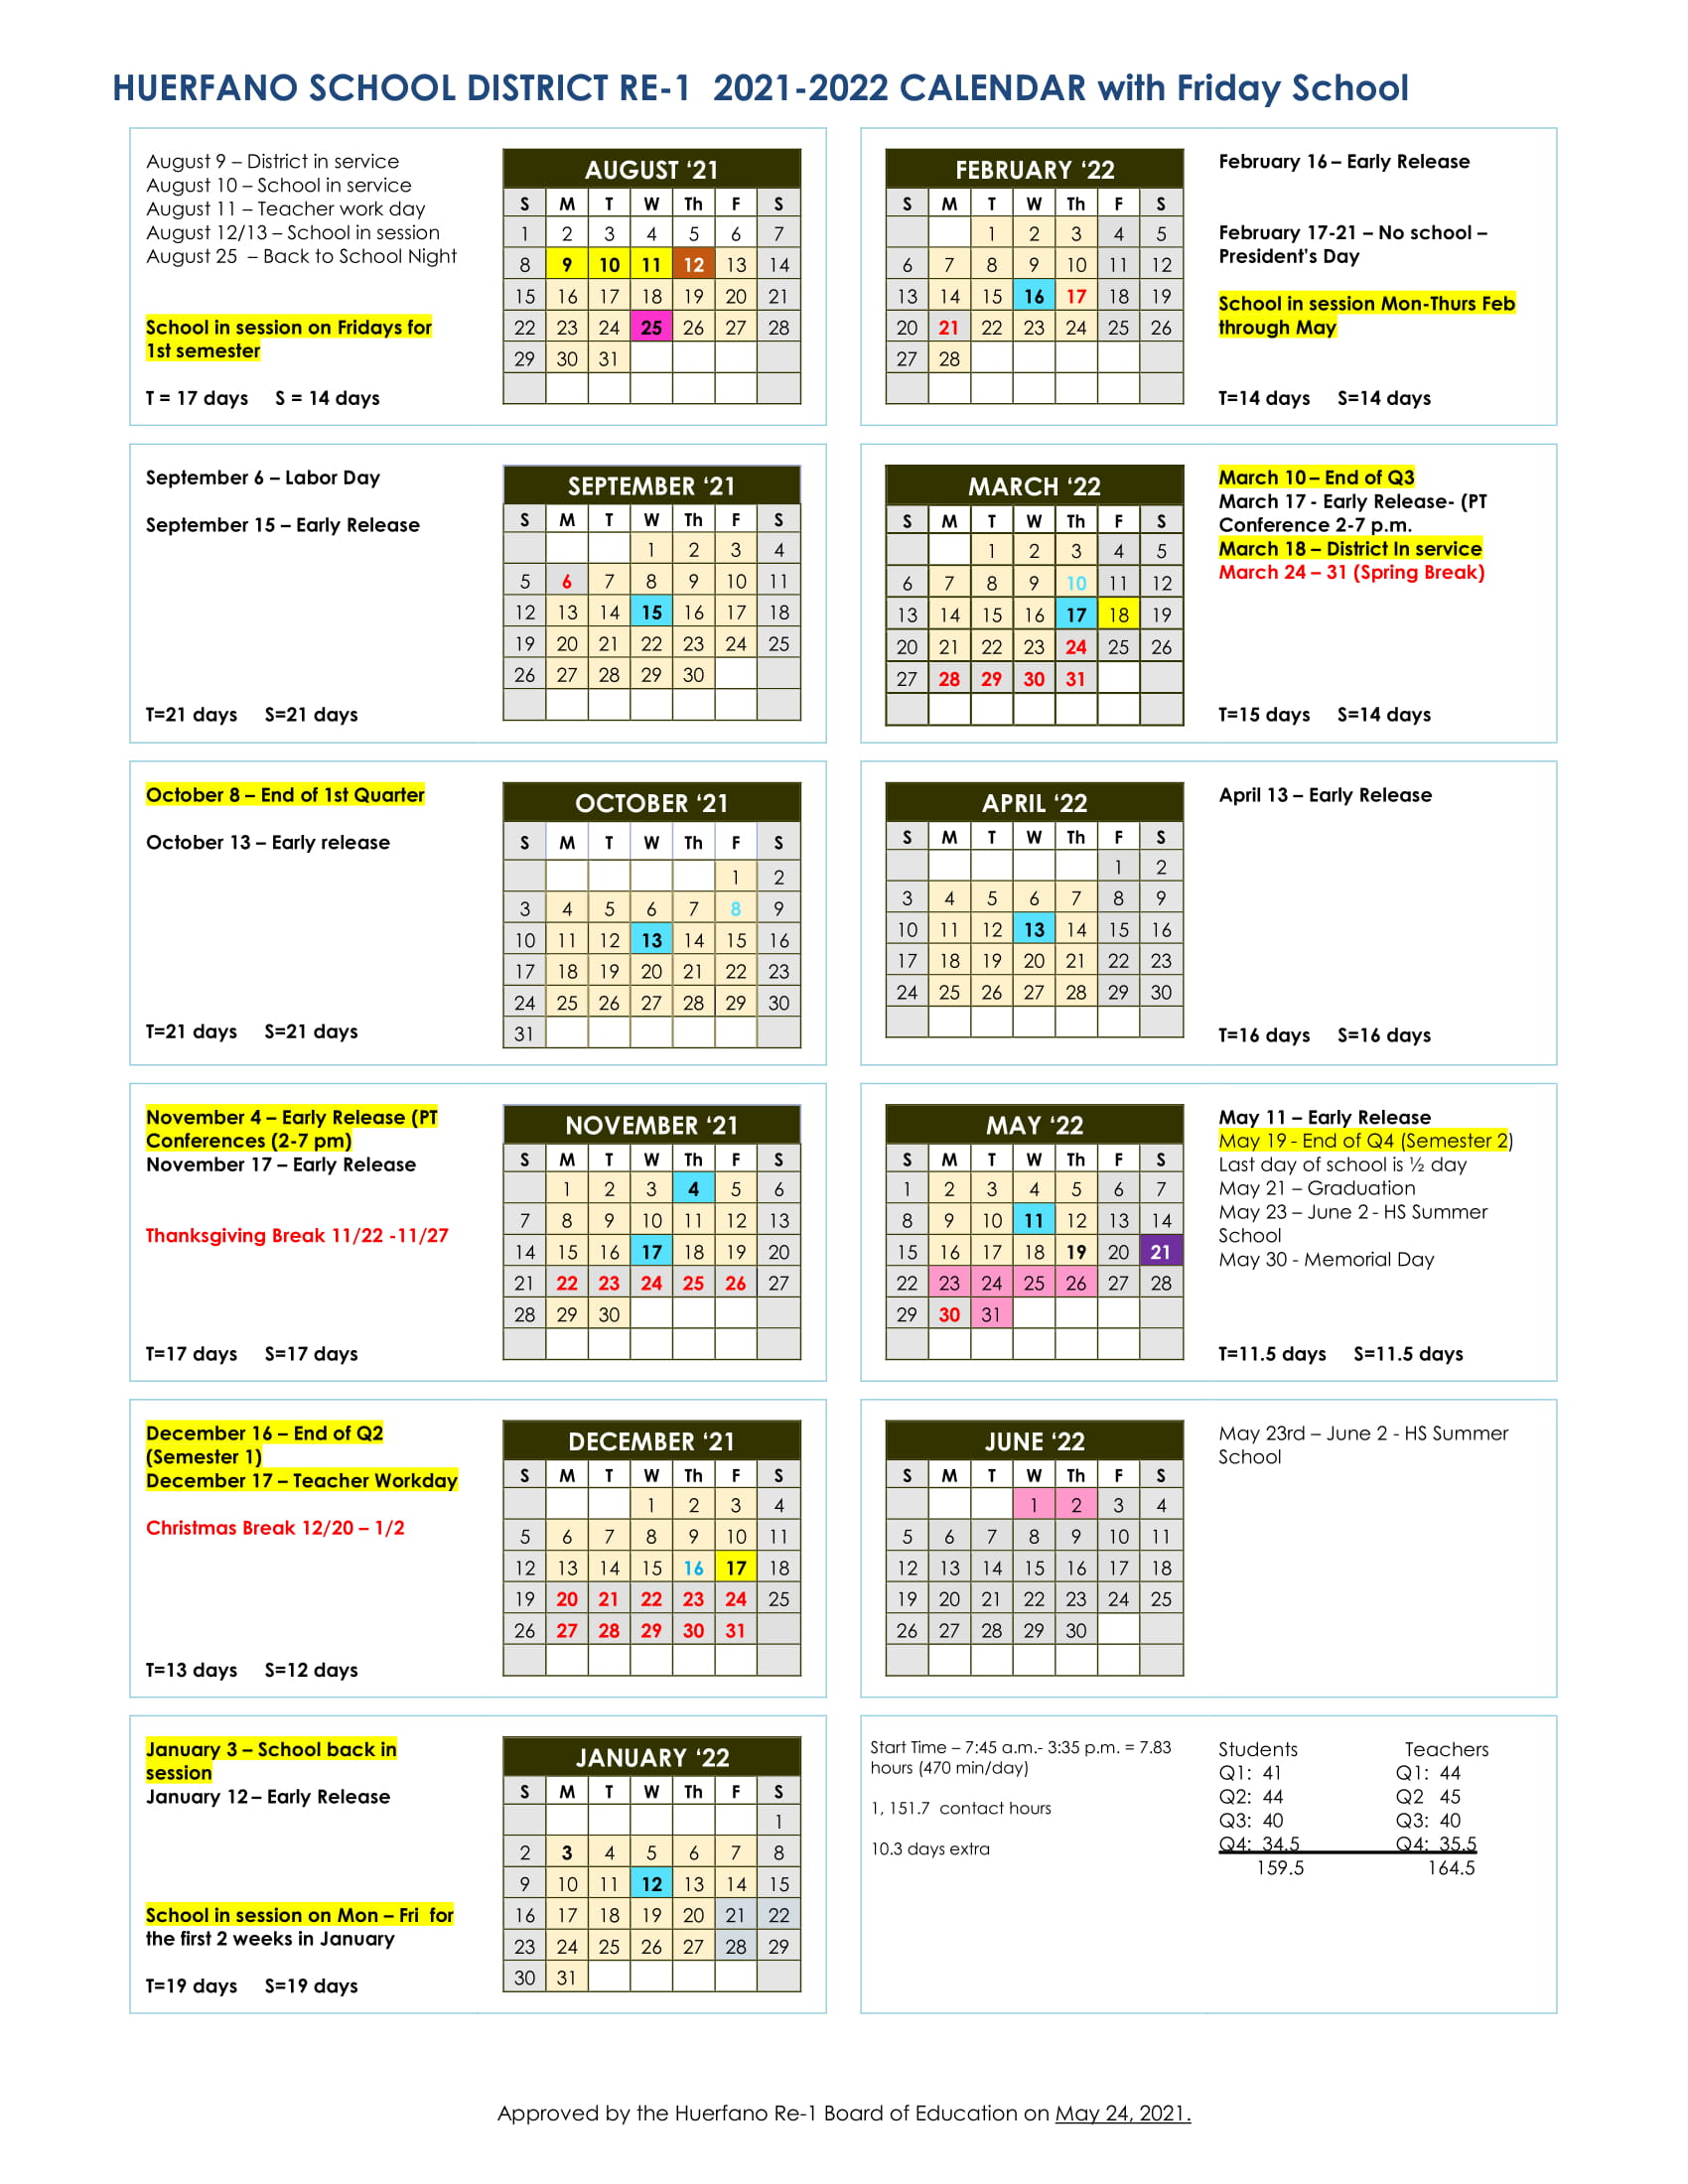 21-22 Calendar Image